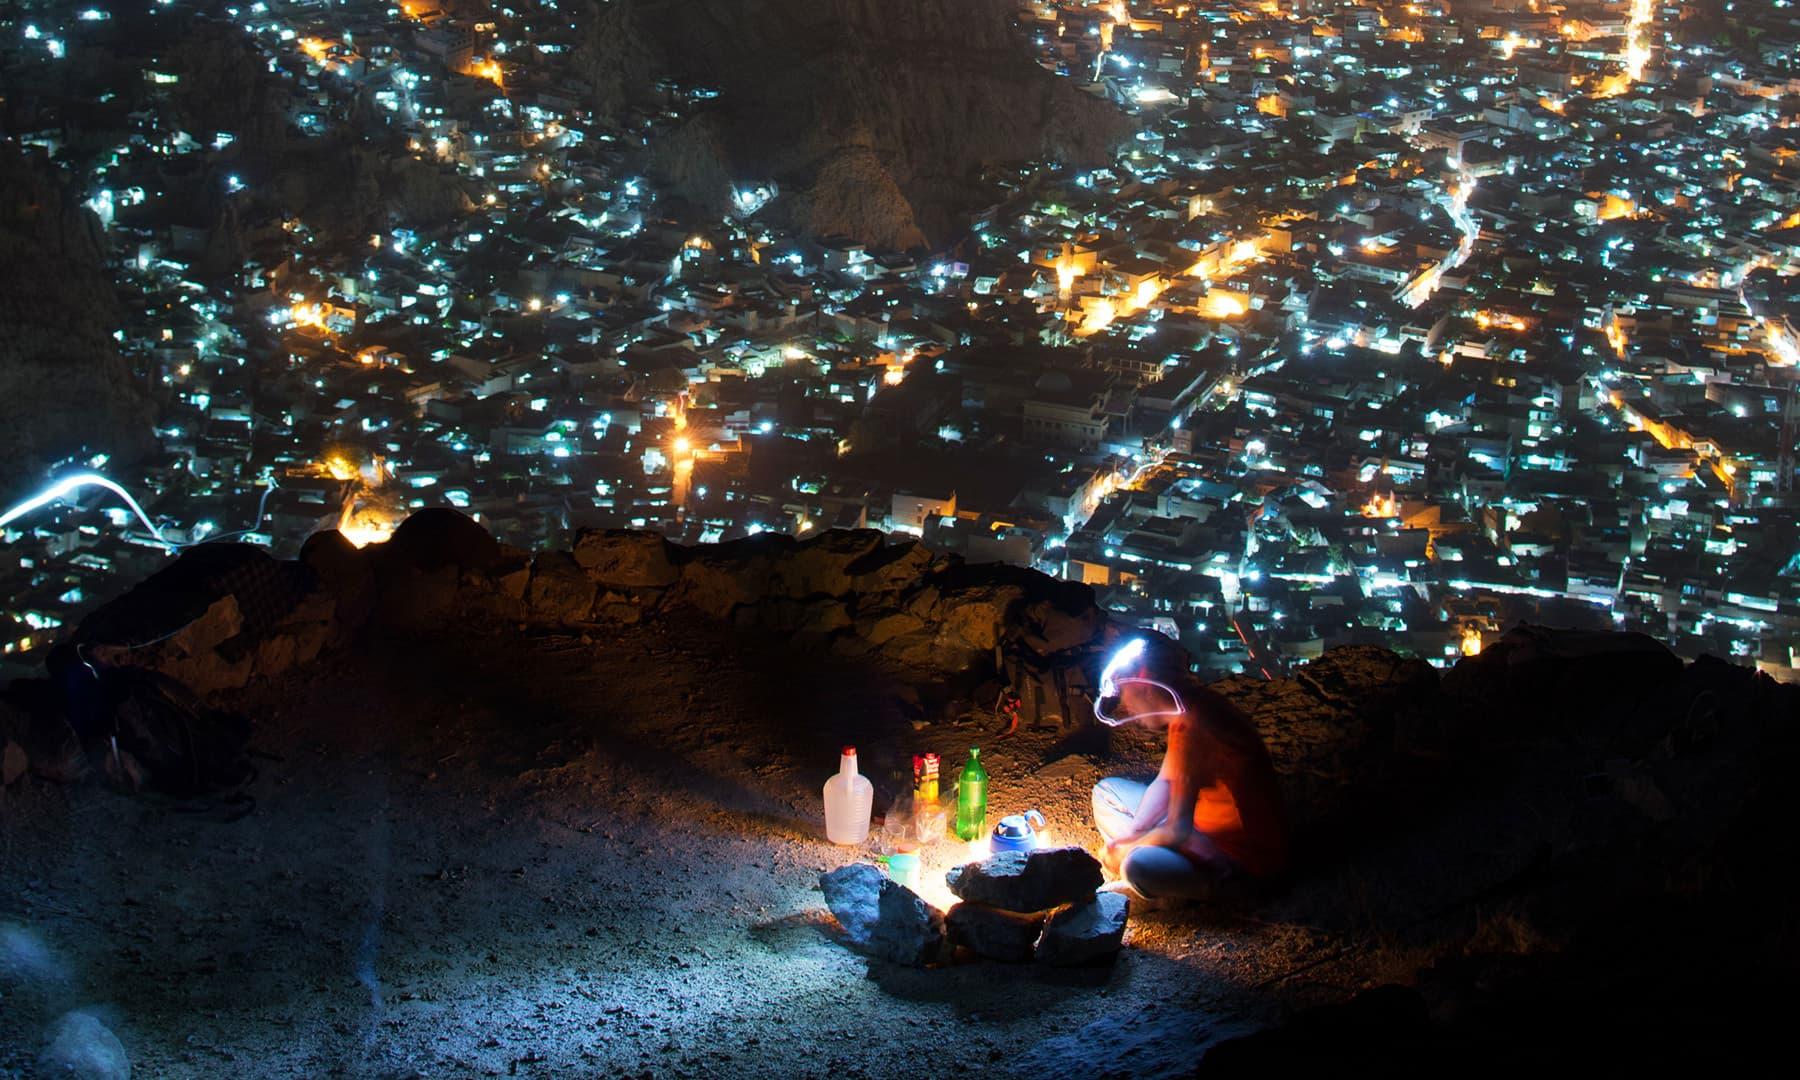 Beautiful-Paistan-Quetta-DailyPakistan-03